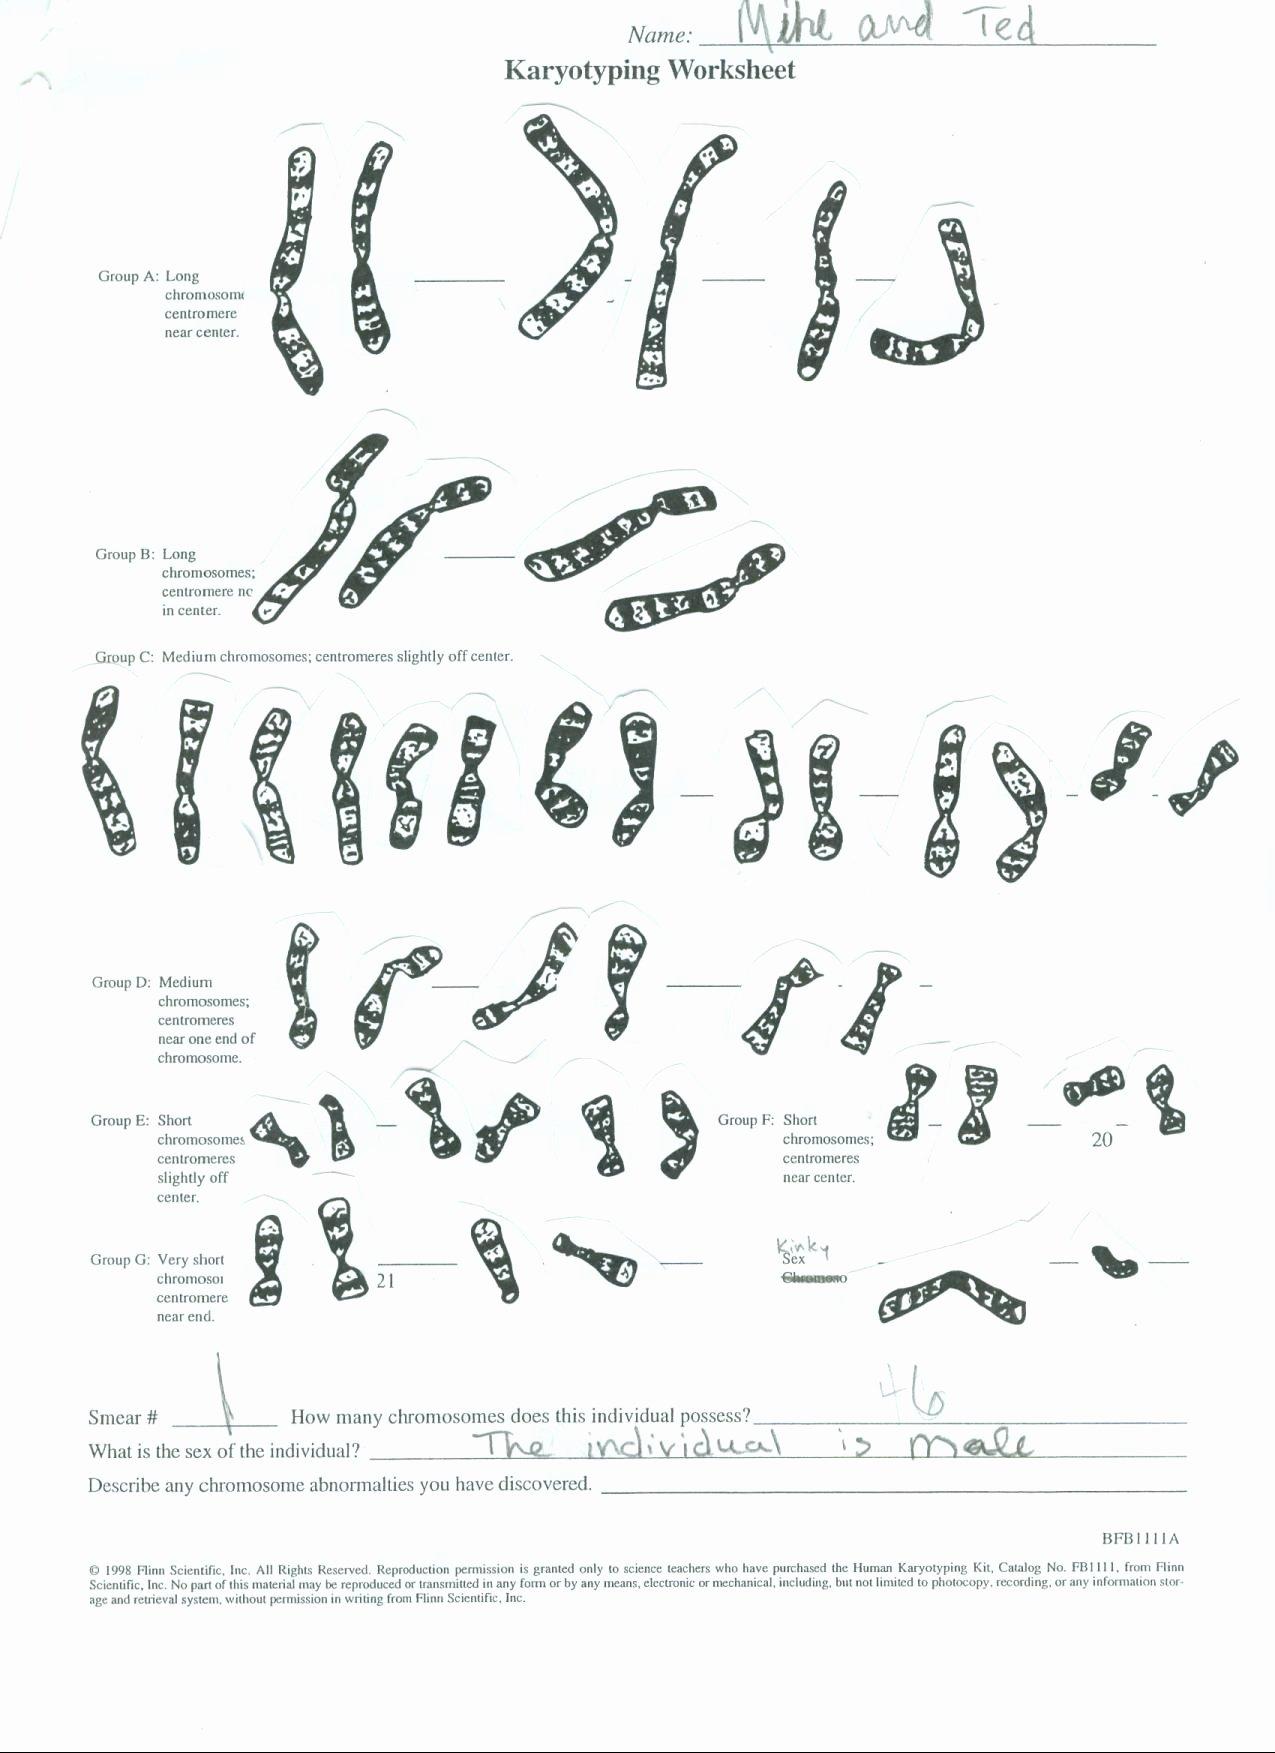 Biology Karyotype Worksheet Answers Key Best Of Worksheet Karyotyping Worksheet Grass Fedjp Worksheet